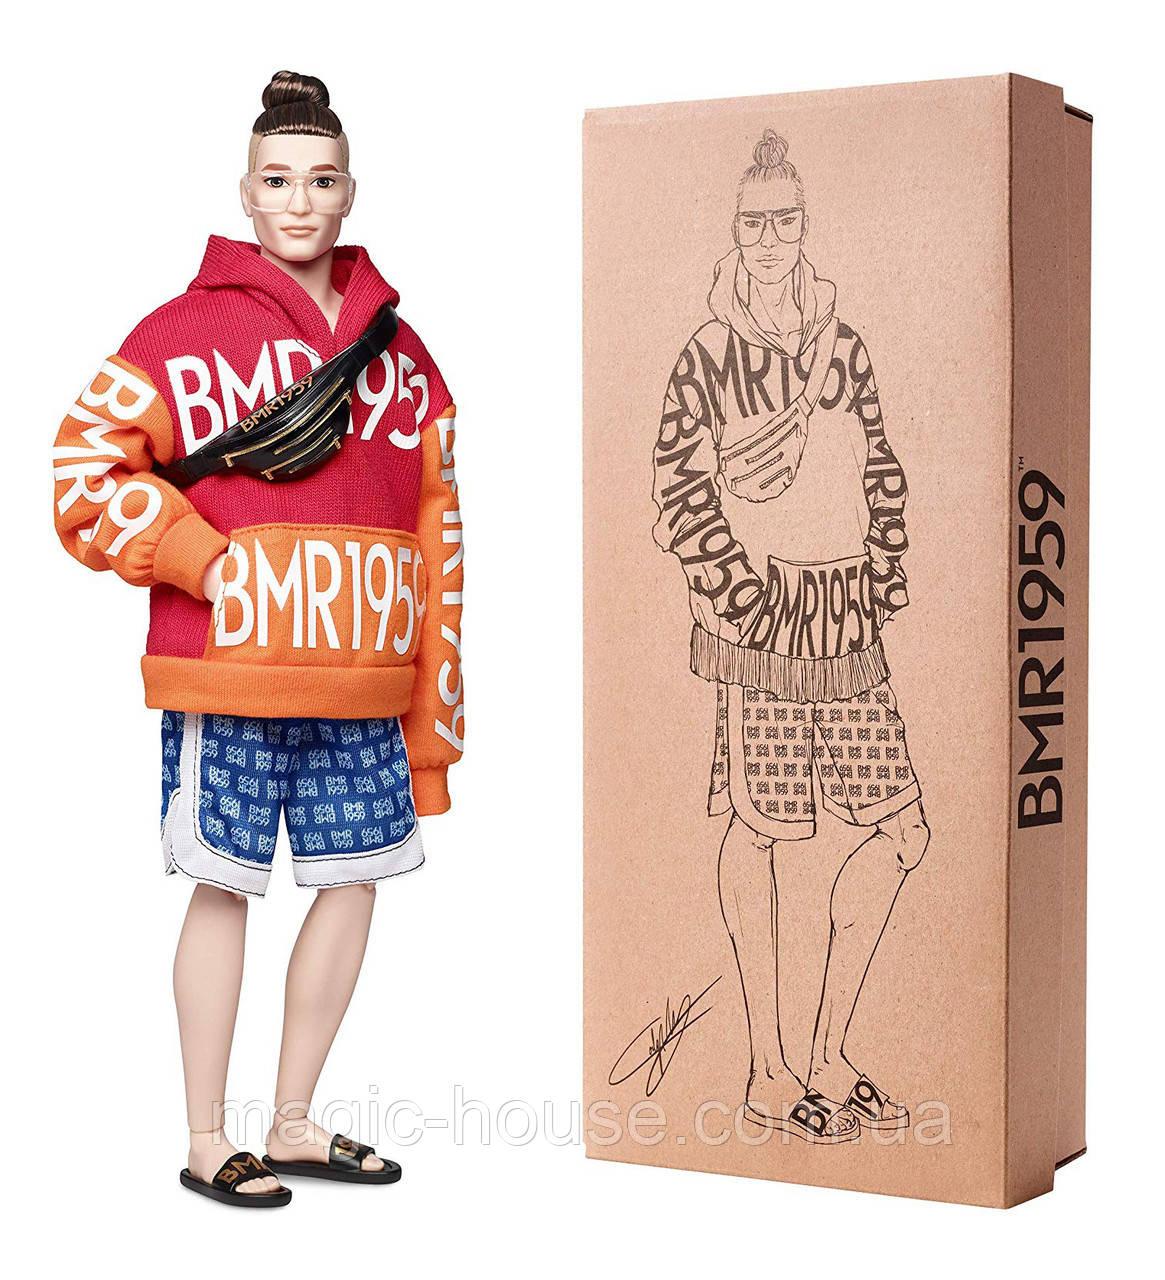 Кукла Барби Кен Barbie BMR1959 Ken Fully Poseable Fashion Dollоригинал от Mattel